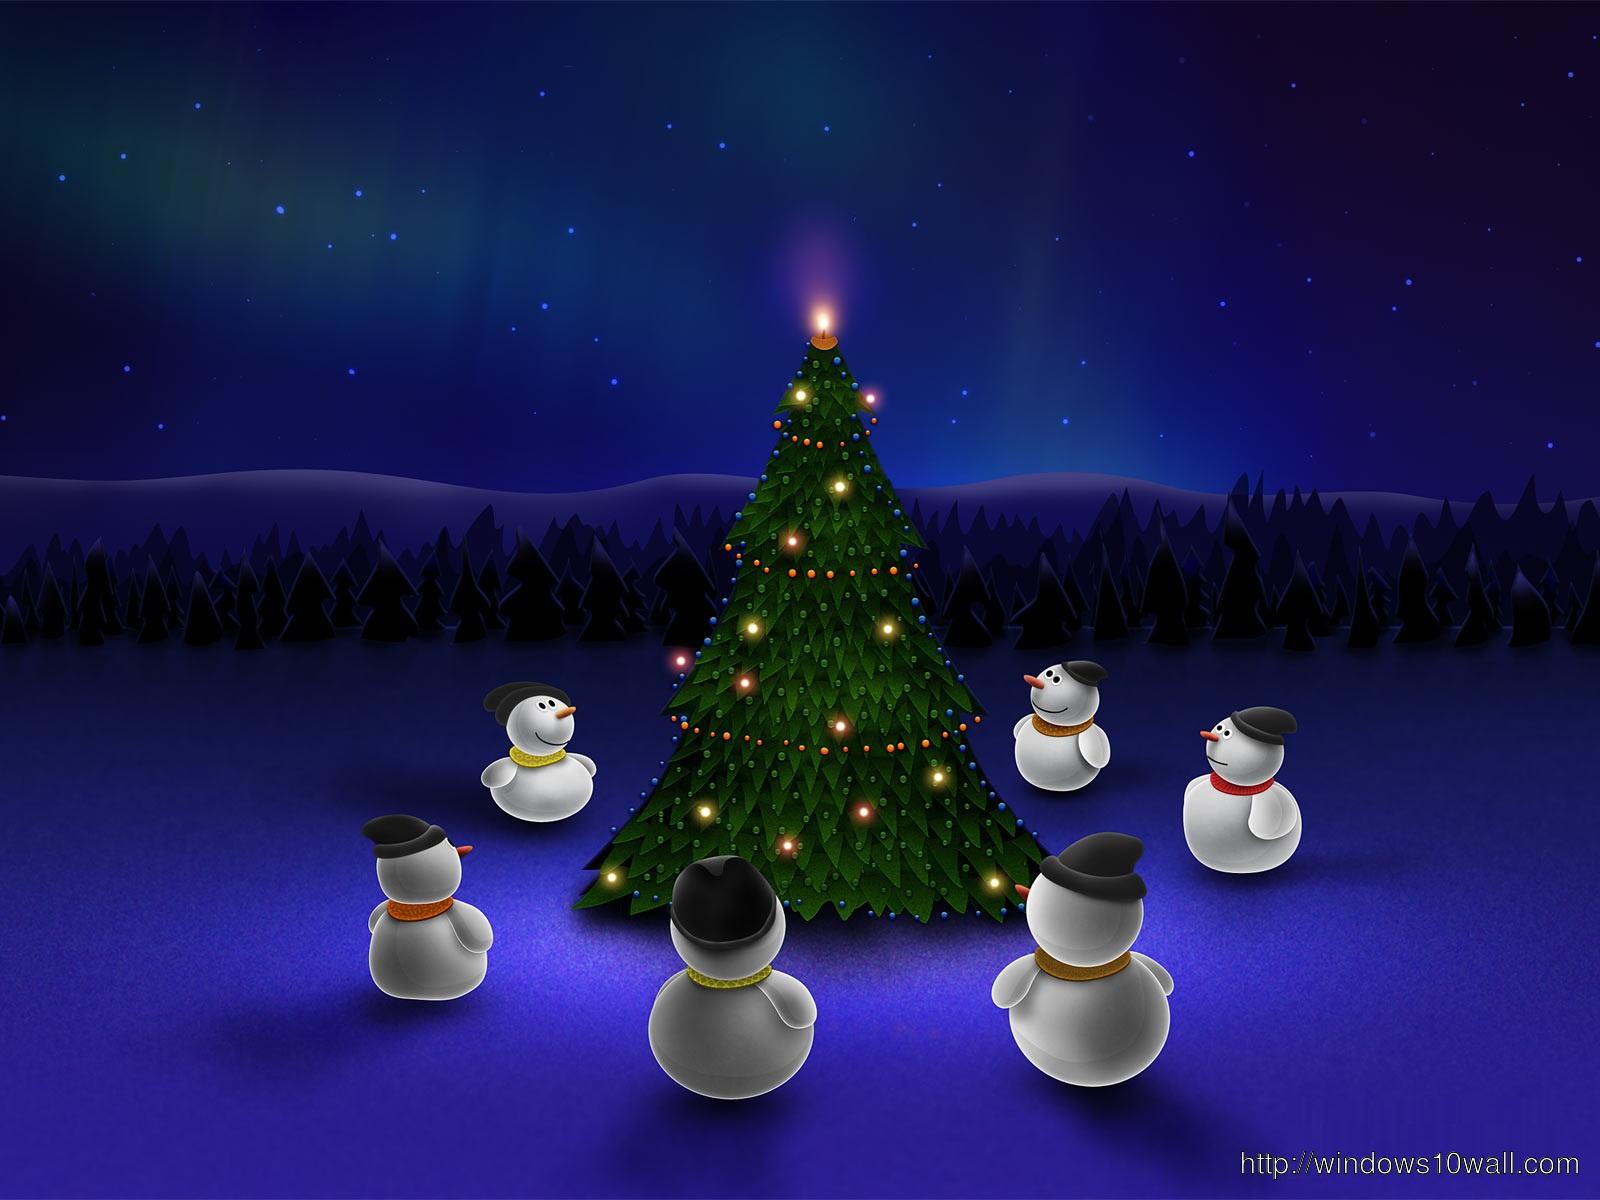 Free Live Christmas Wallpaper For Desktop Windows 10